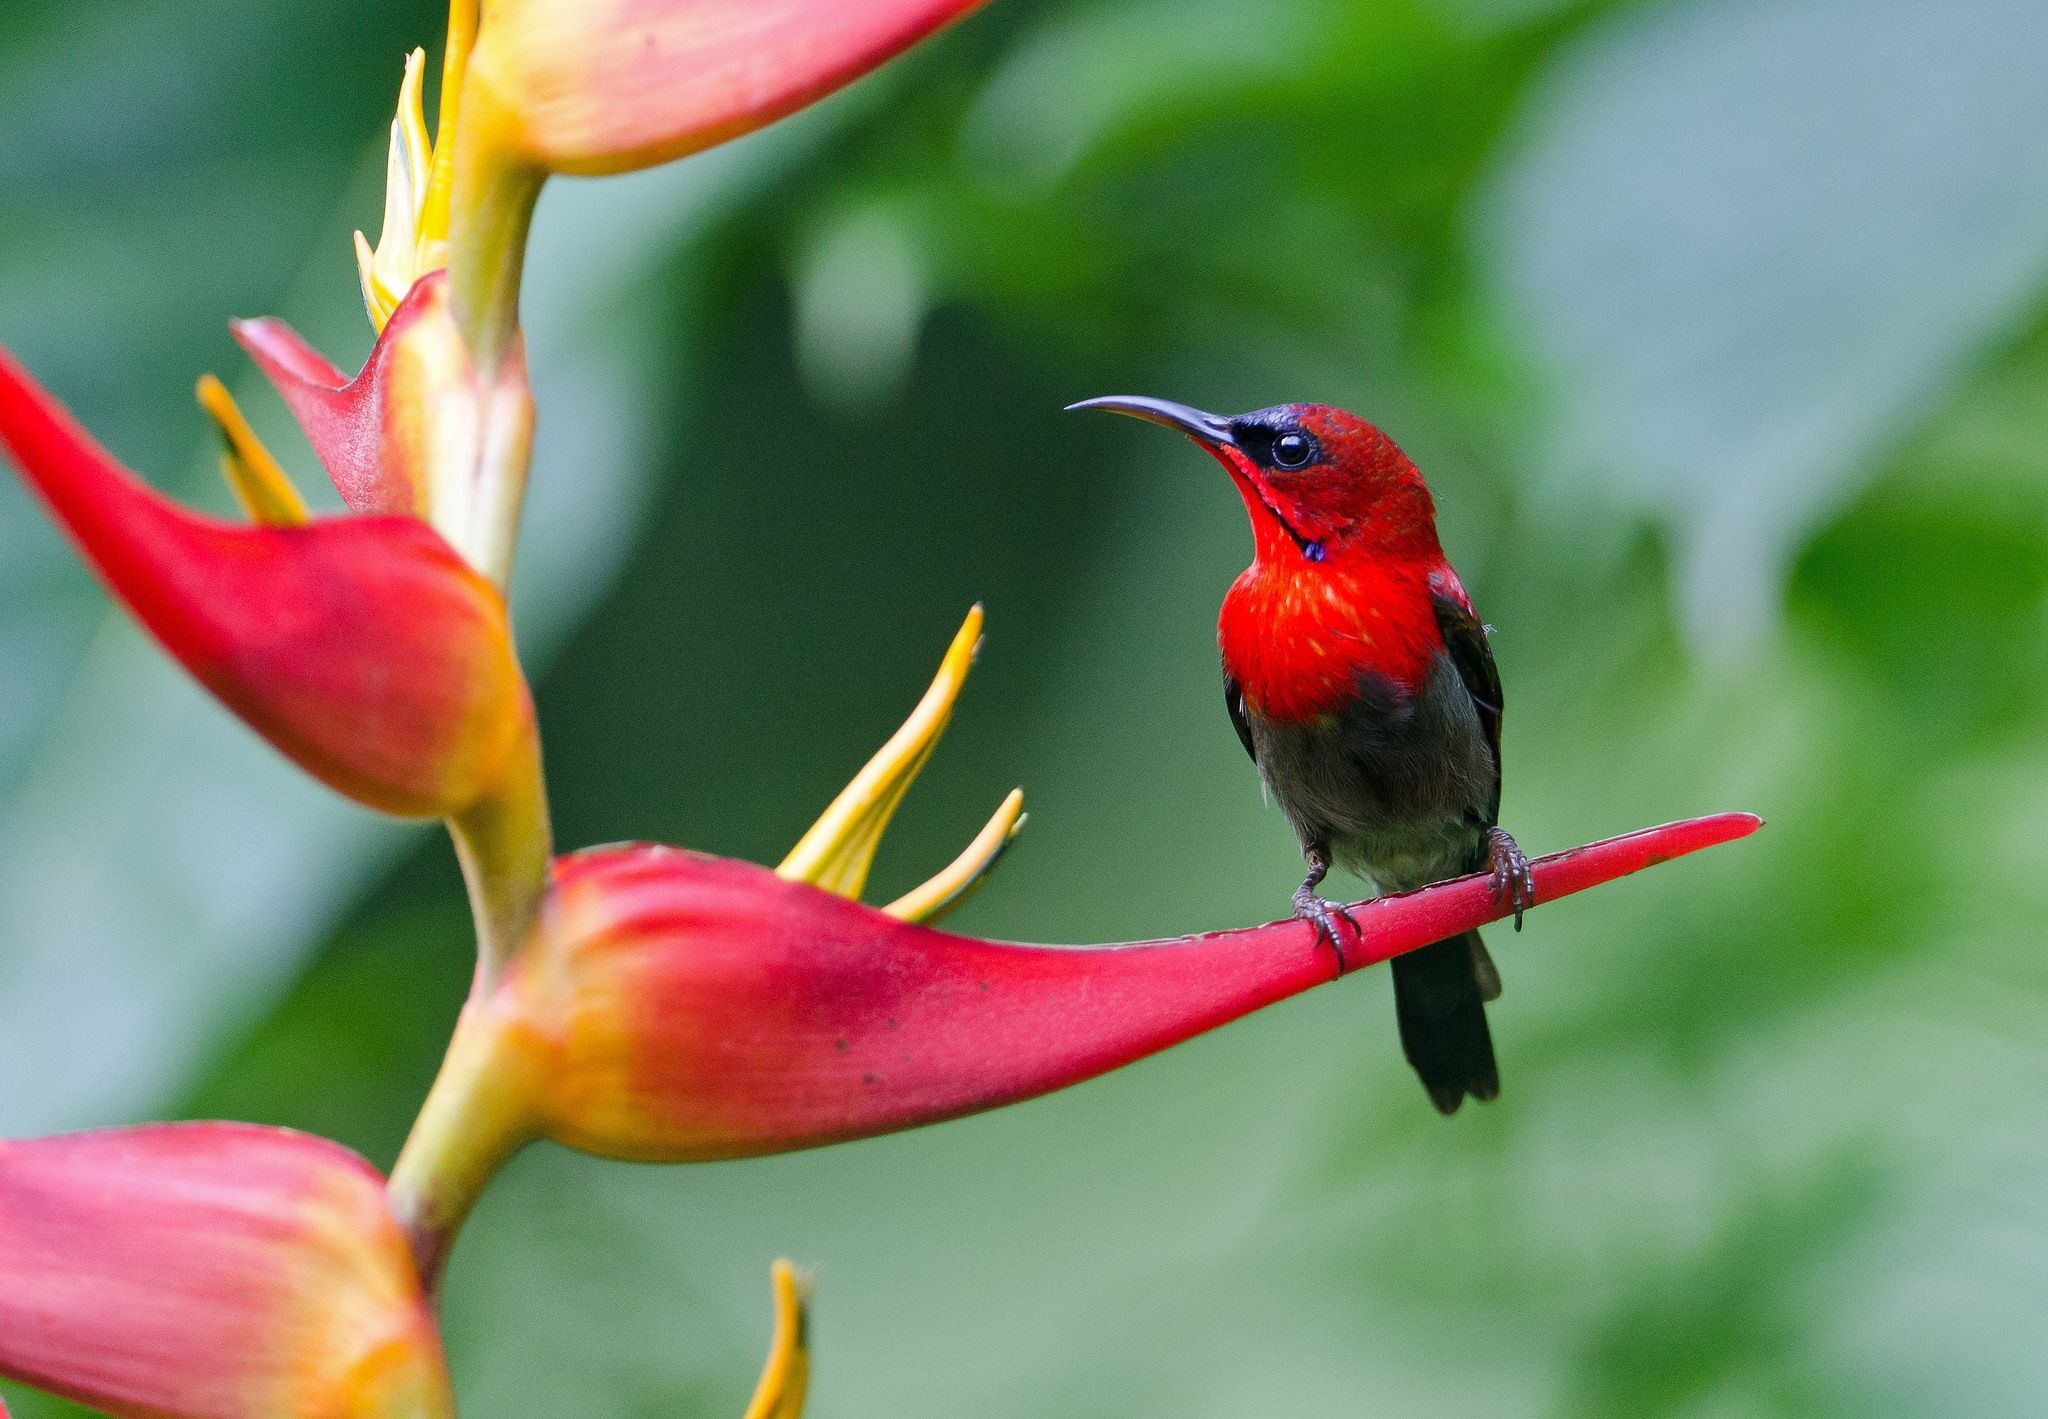 Red Bird Animal Red Flower wallpaper by parislane